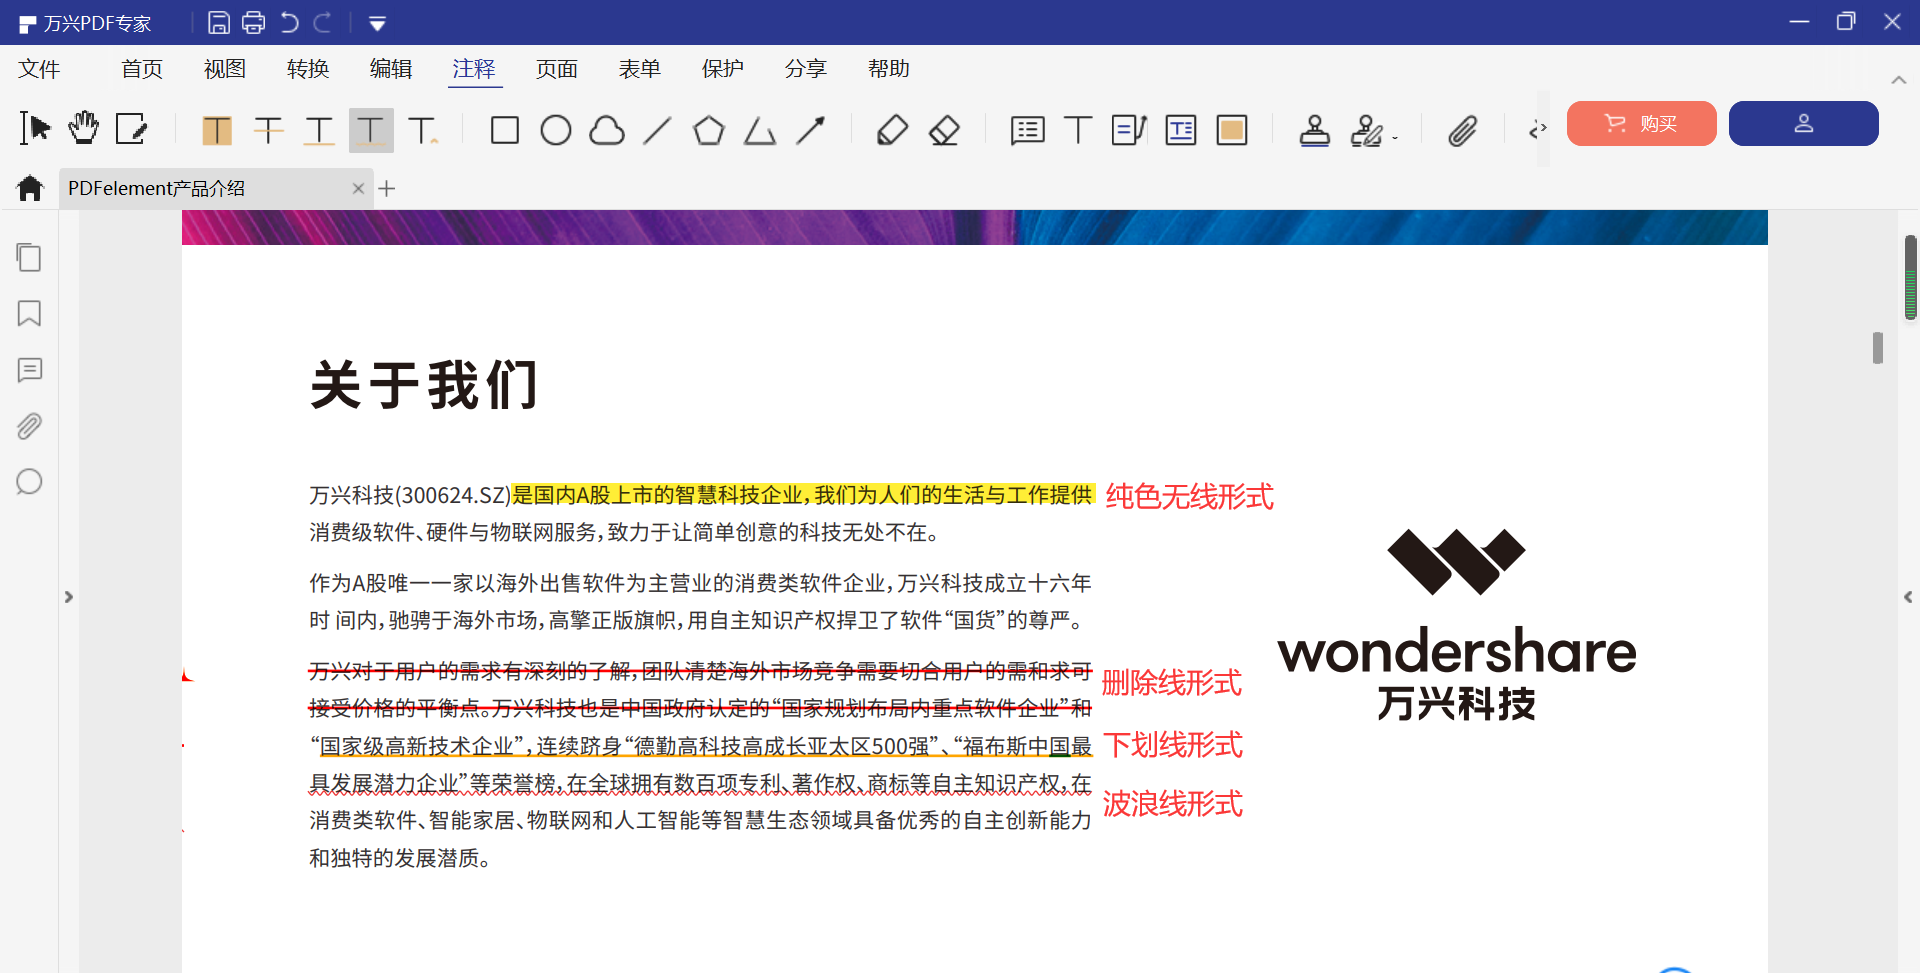 PDF文档注释步骤3